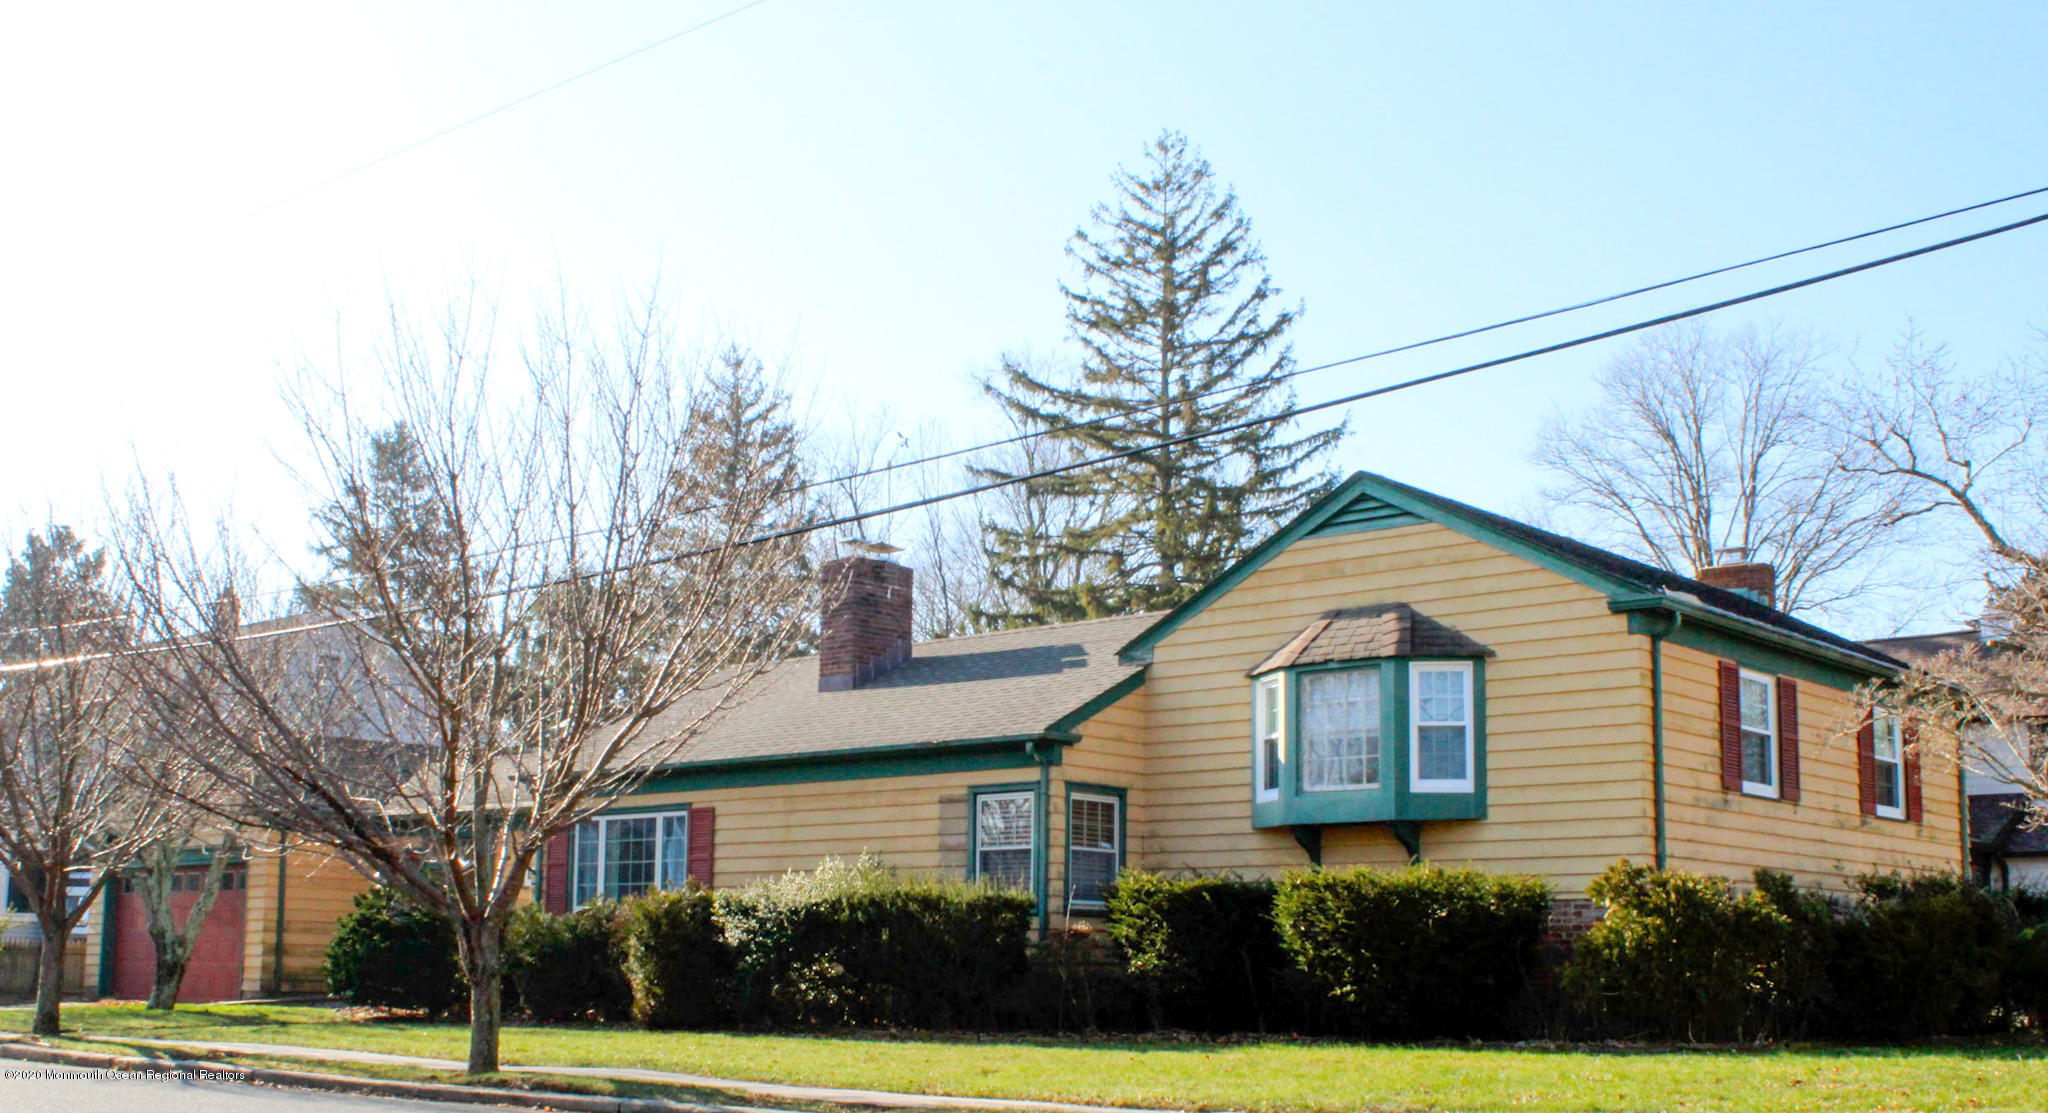 Photo of 901 Gowdy Avenue, Point Pleasant Beach, NJ 08742